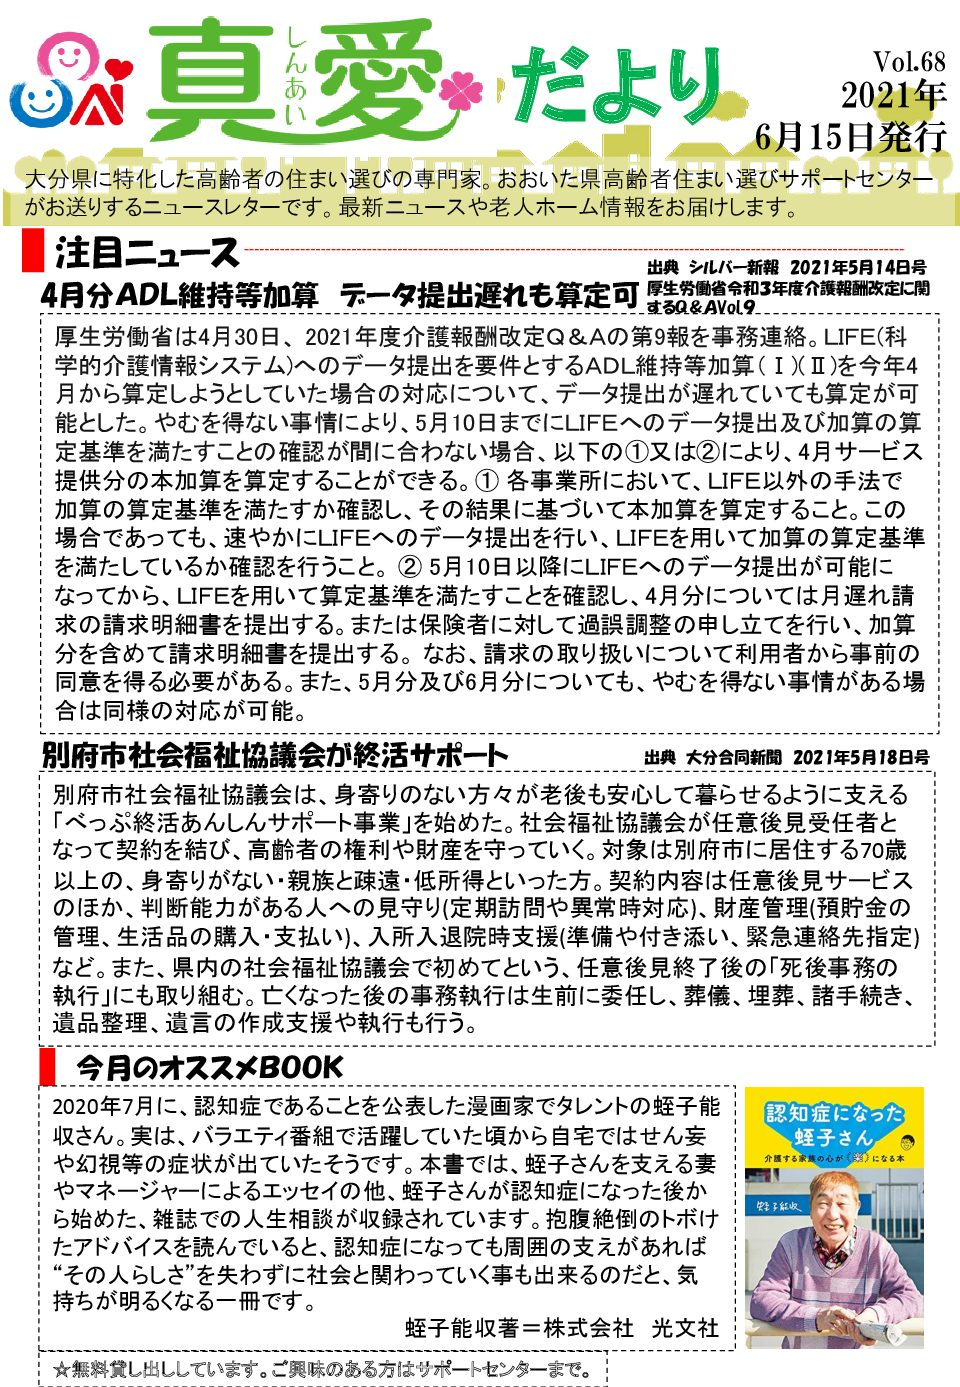 【Vol.68】 2021.6.15発行